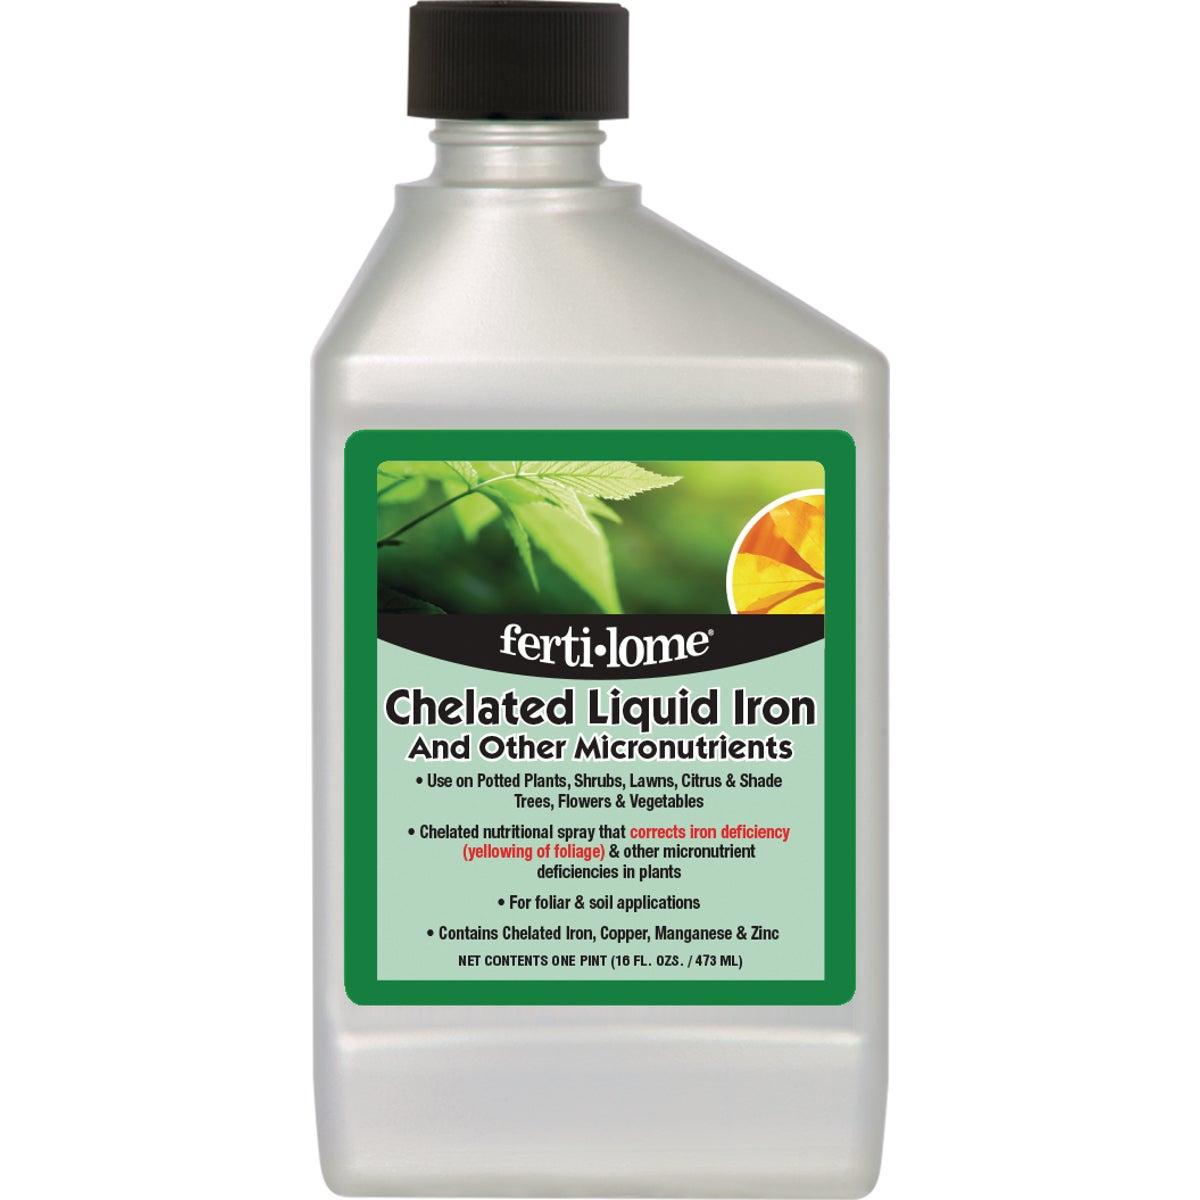 VPG Fertilome 10625 Ferti-lome Iron Liquid Plant Food-16 OZ IRON at Sears.com